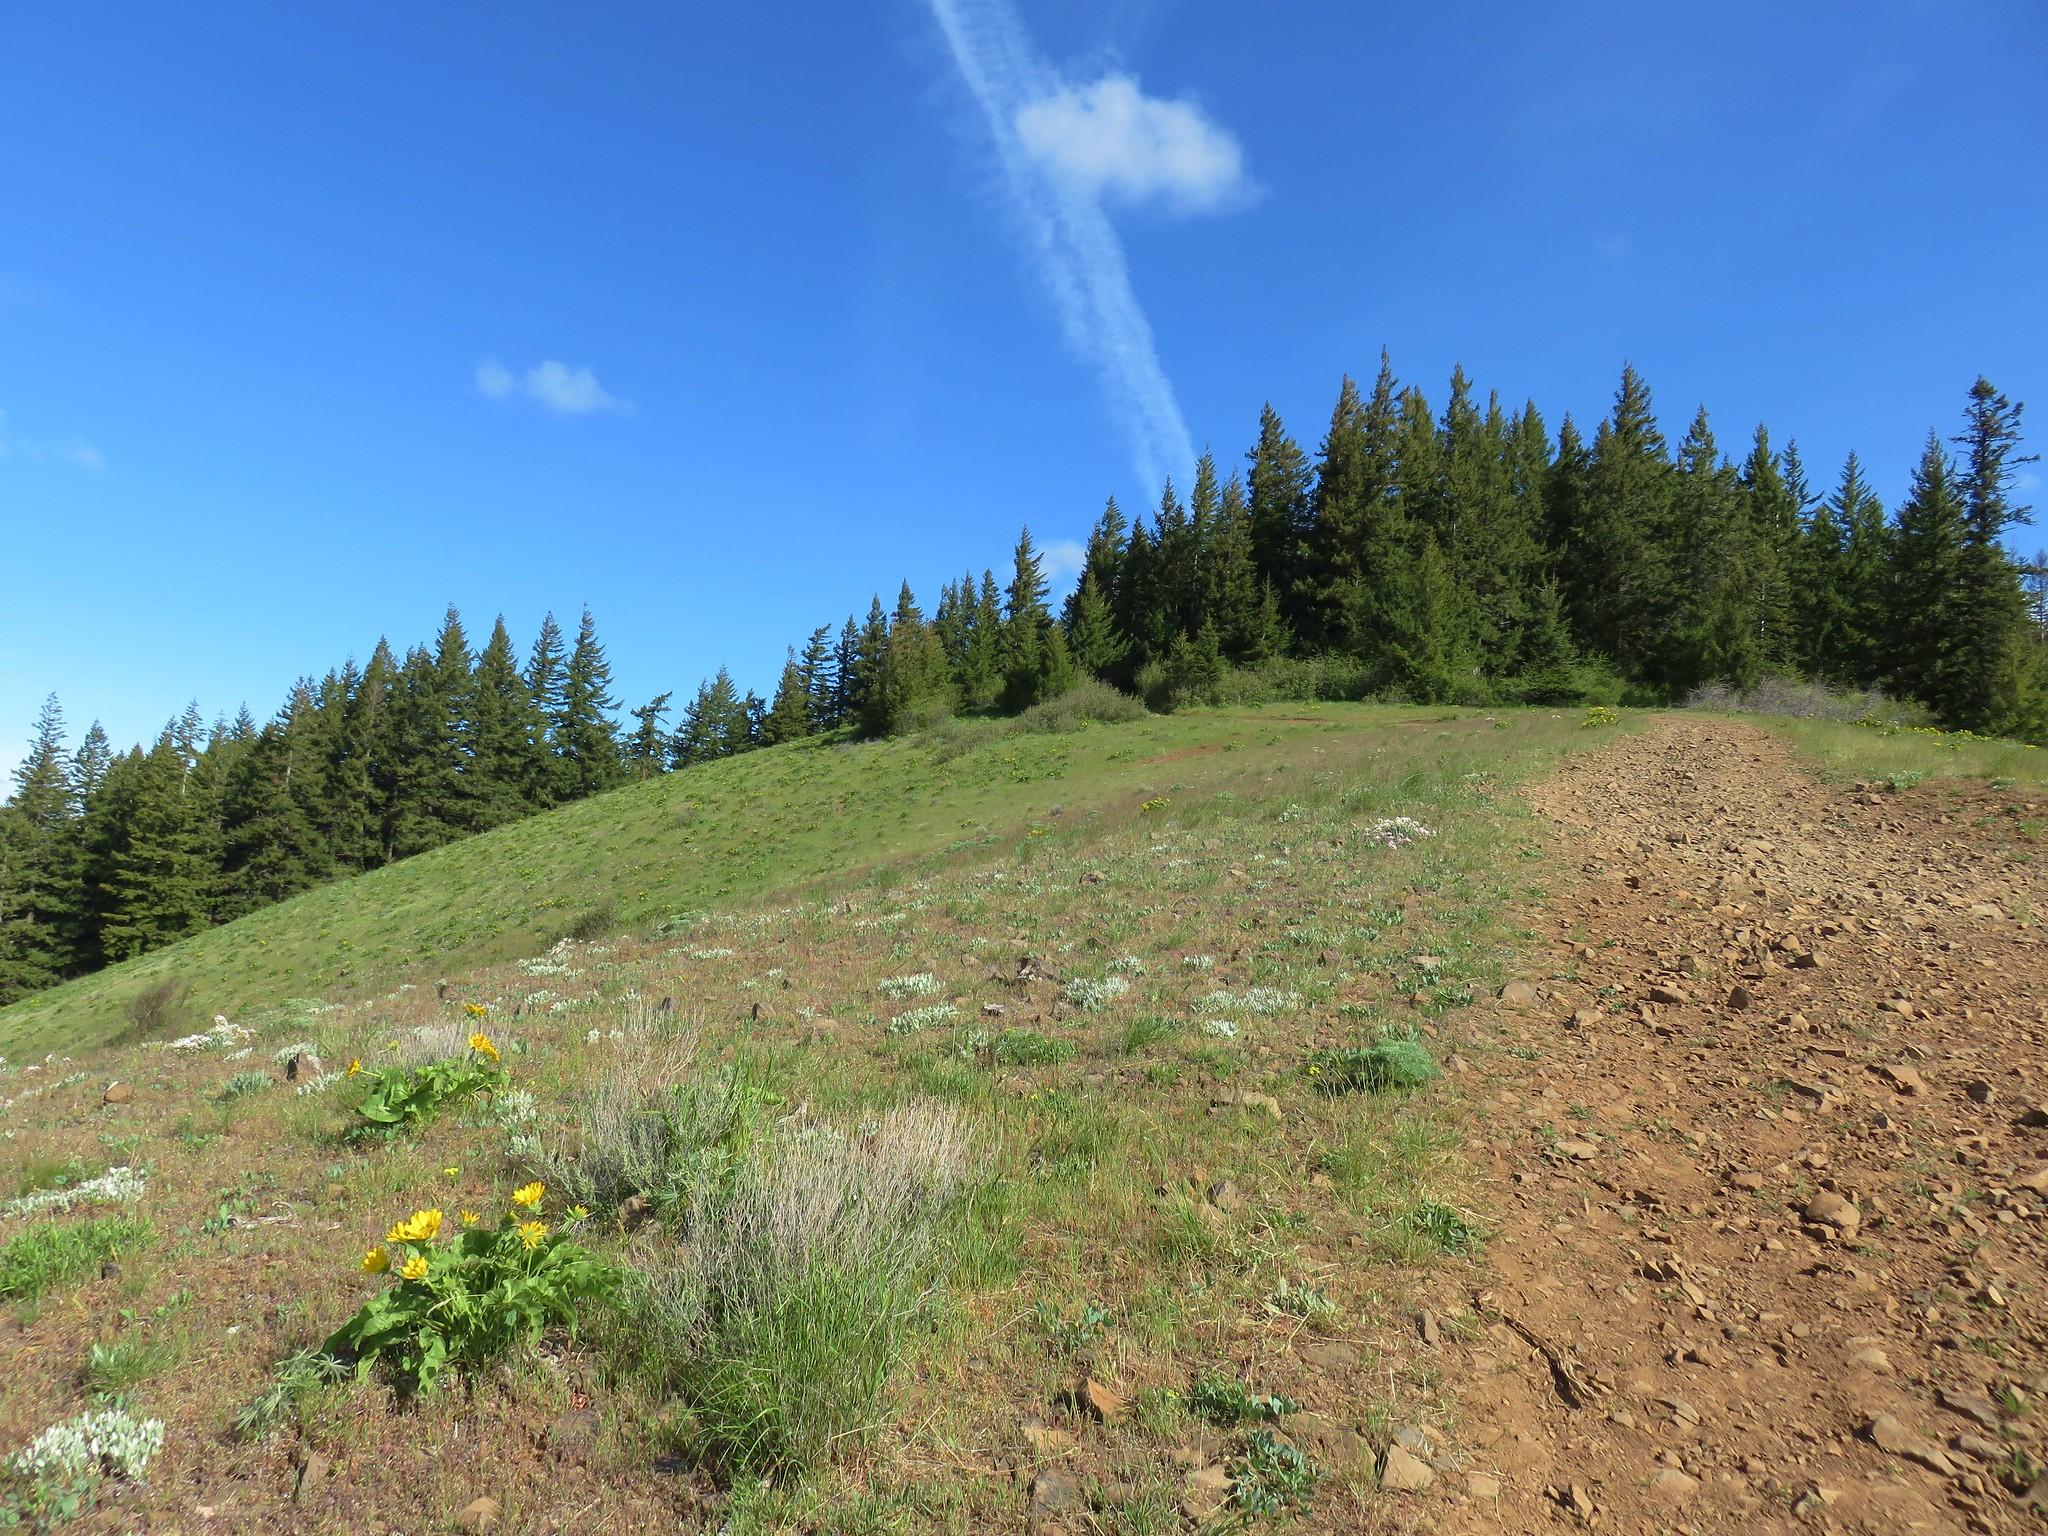 Heading toward Bald Butte